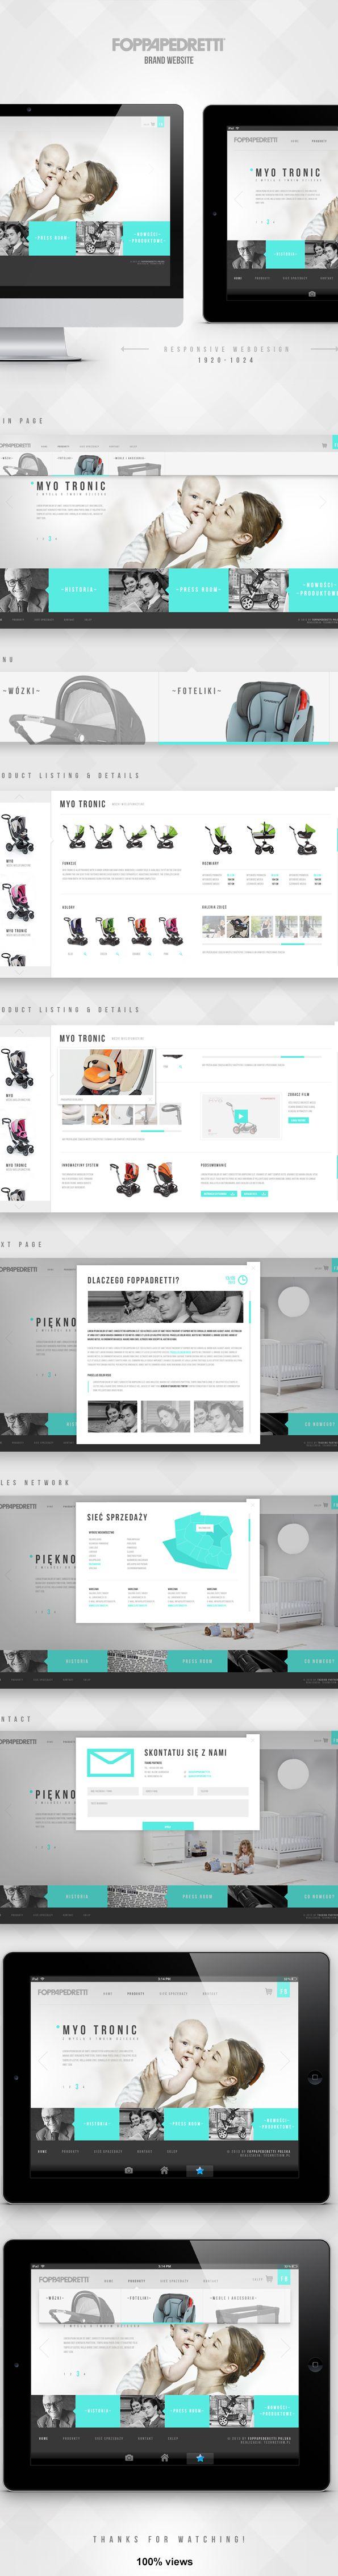 Foppapedretti – Store For Baby by Paweł Śliwa, via Behance #ecommerce